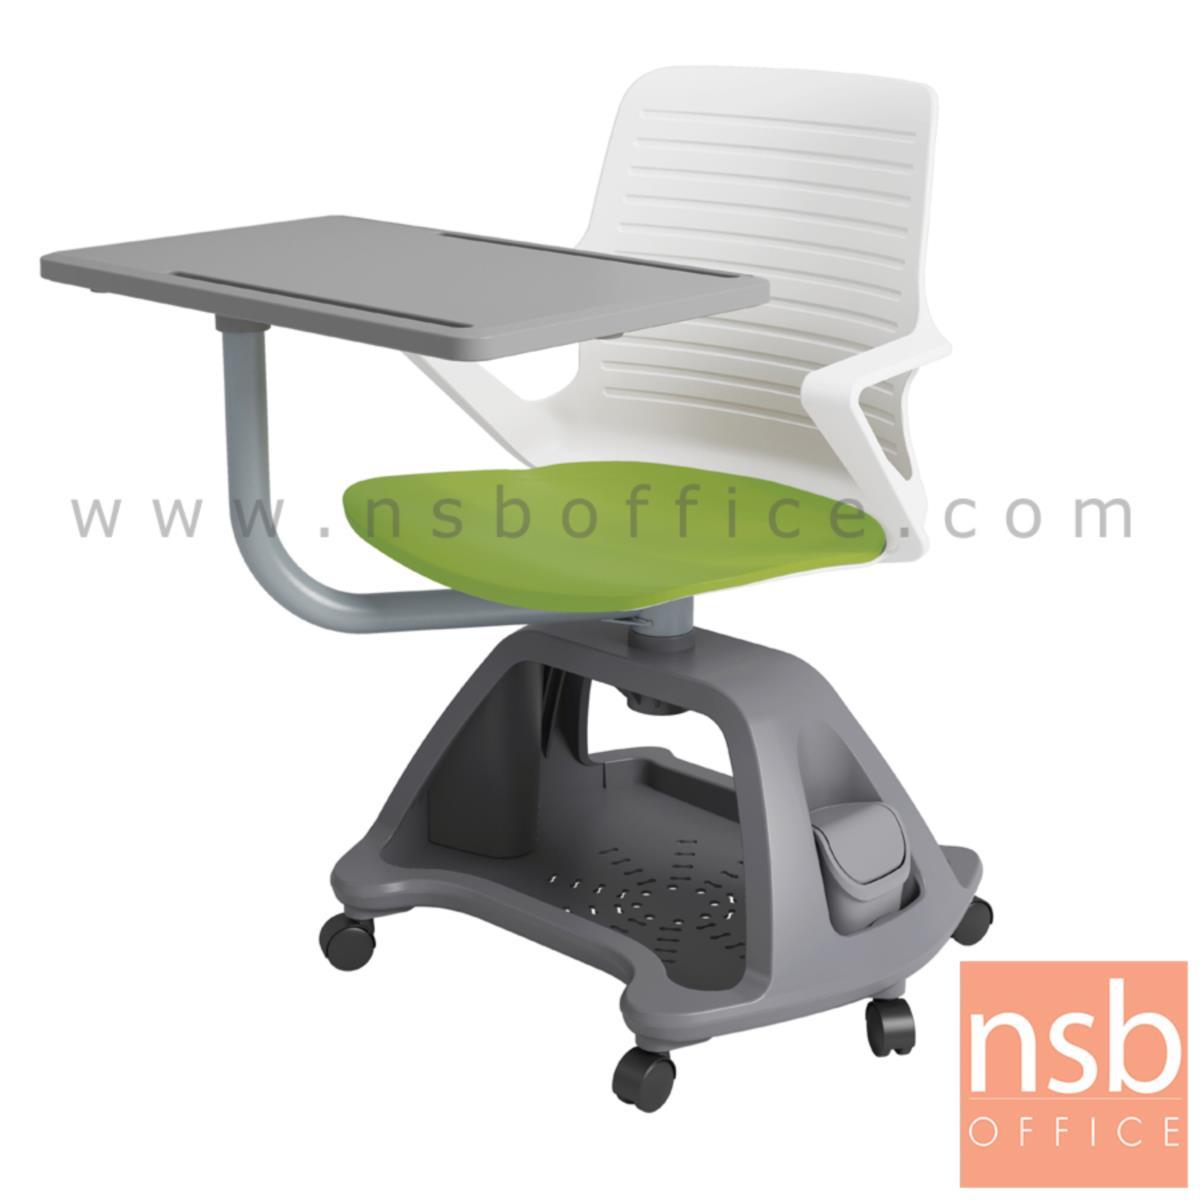 B30A056:เก้าอี้เลคเชอร์เฟรมโพลี่ล้อเลื่อน รุ่น pollen (พอลเลิน) วางกระเป๋าได้